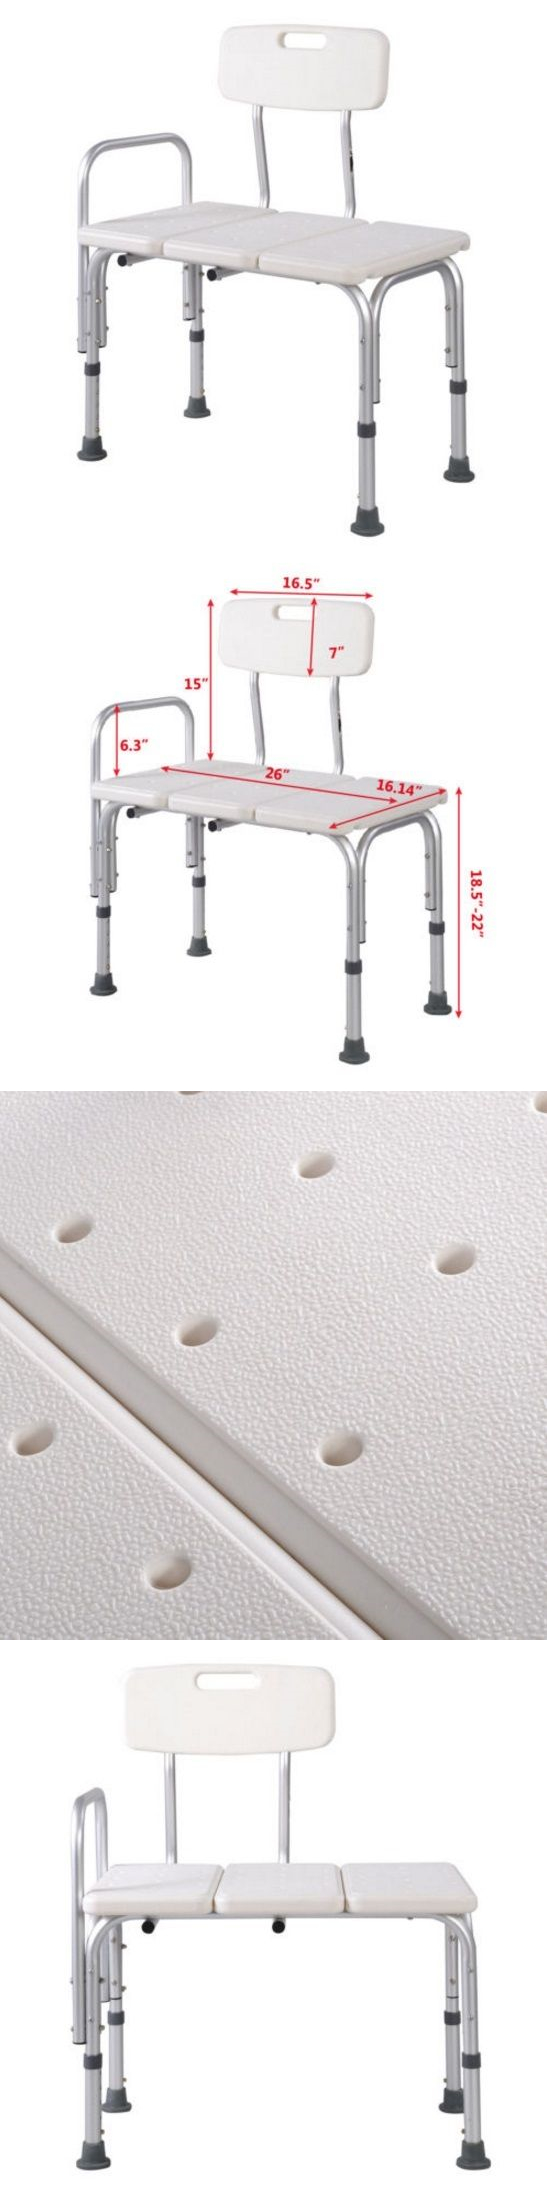 shower and bath seats shower bath seat medical adjustable bathroom tub transfer bench stool chair